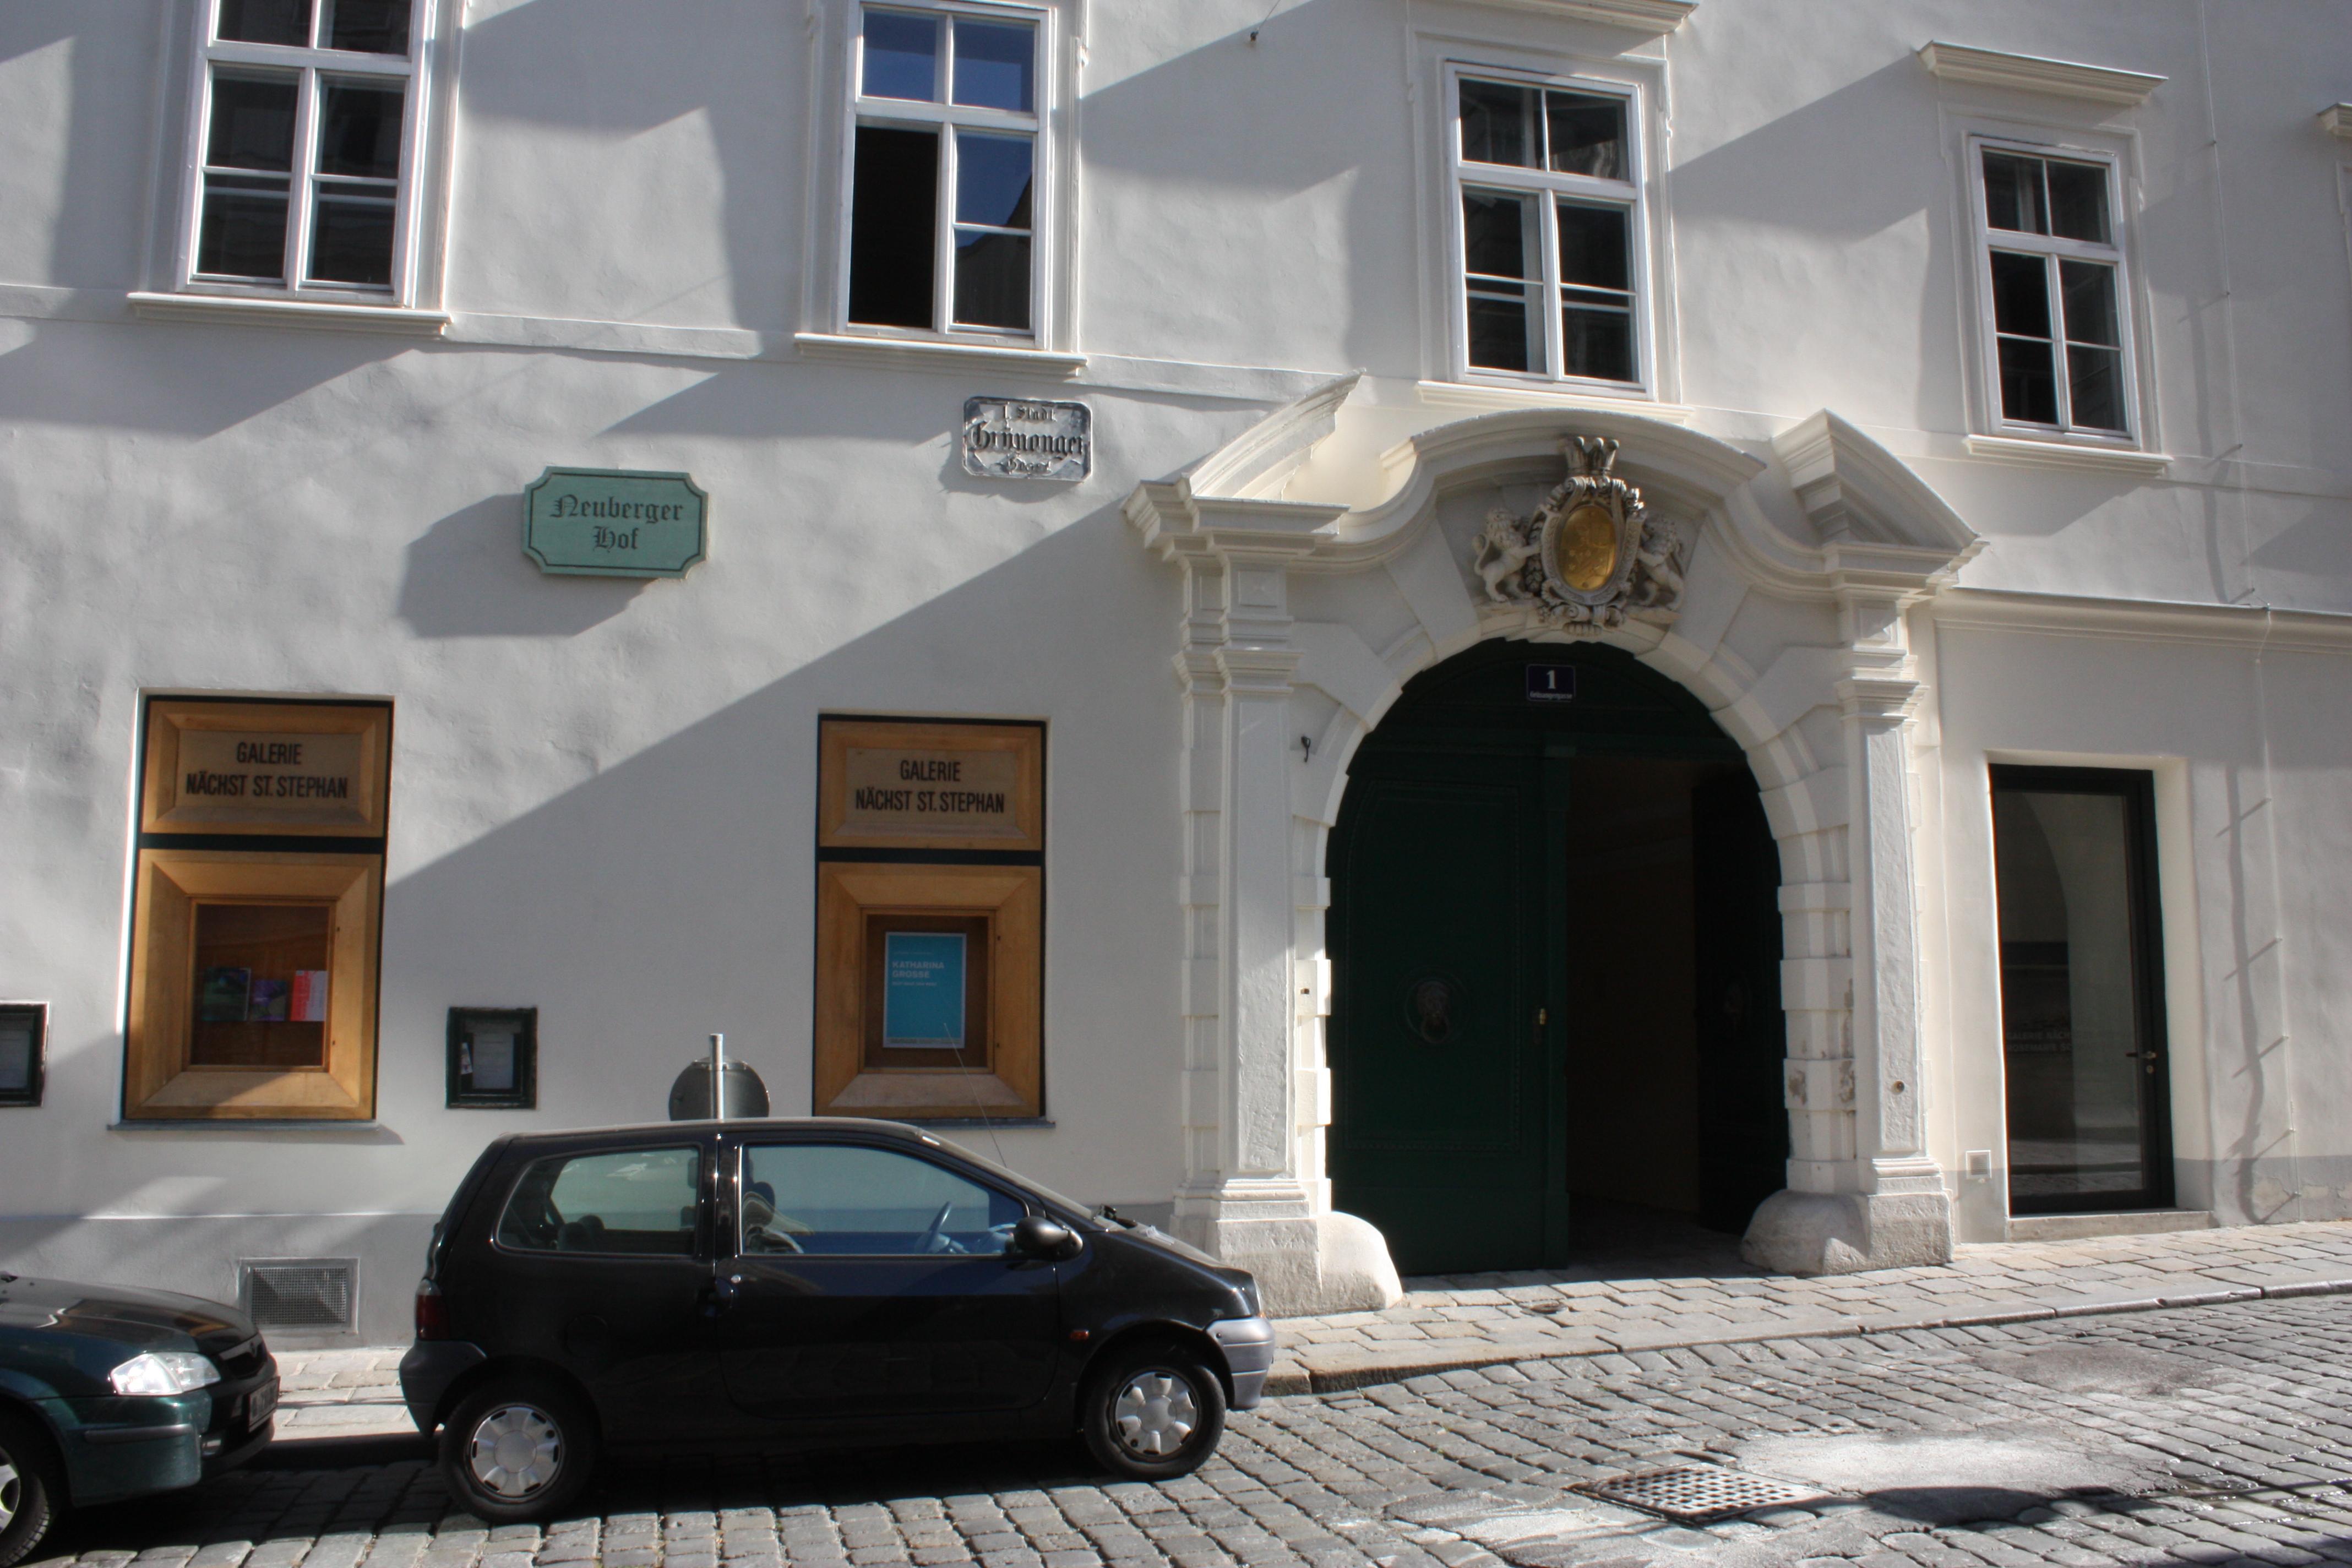 Grünangergasse 1 Wien 2009 PD IMG 7249.JPG